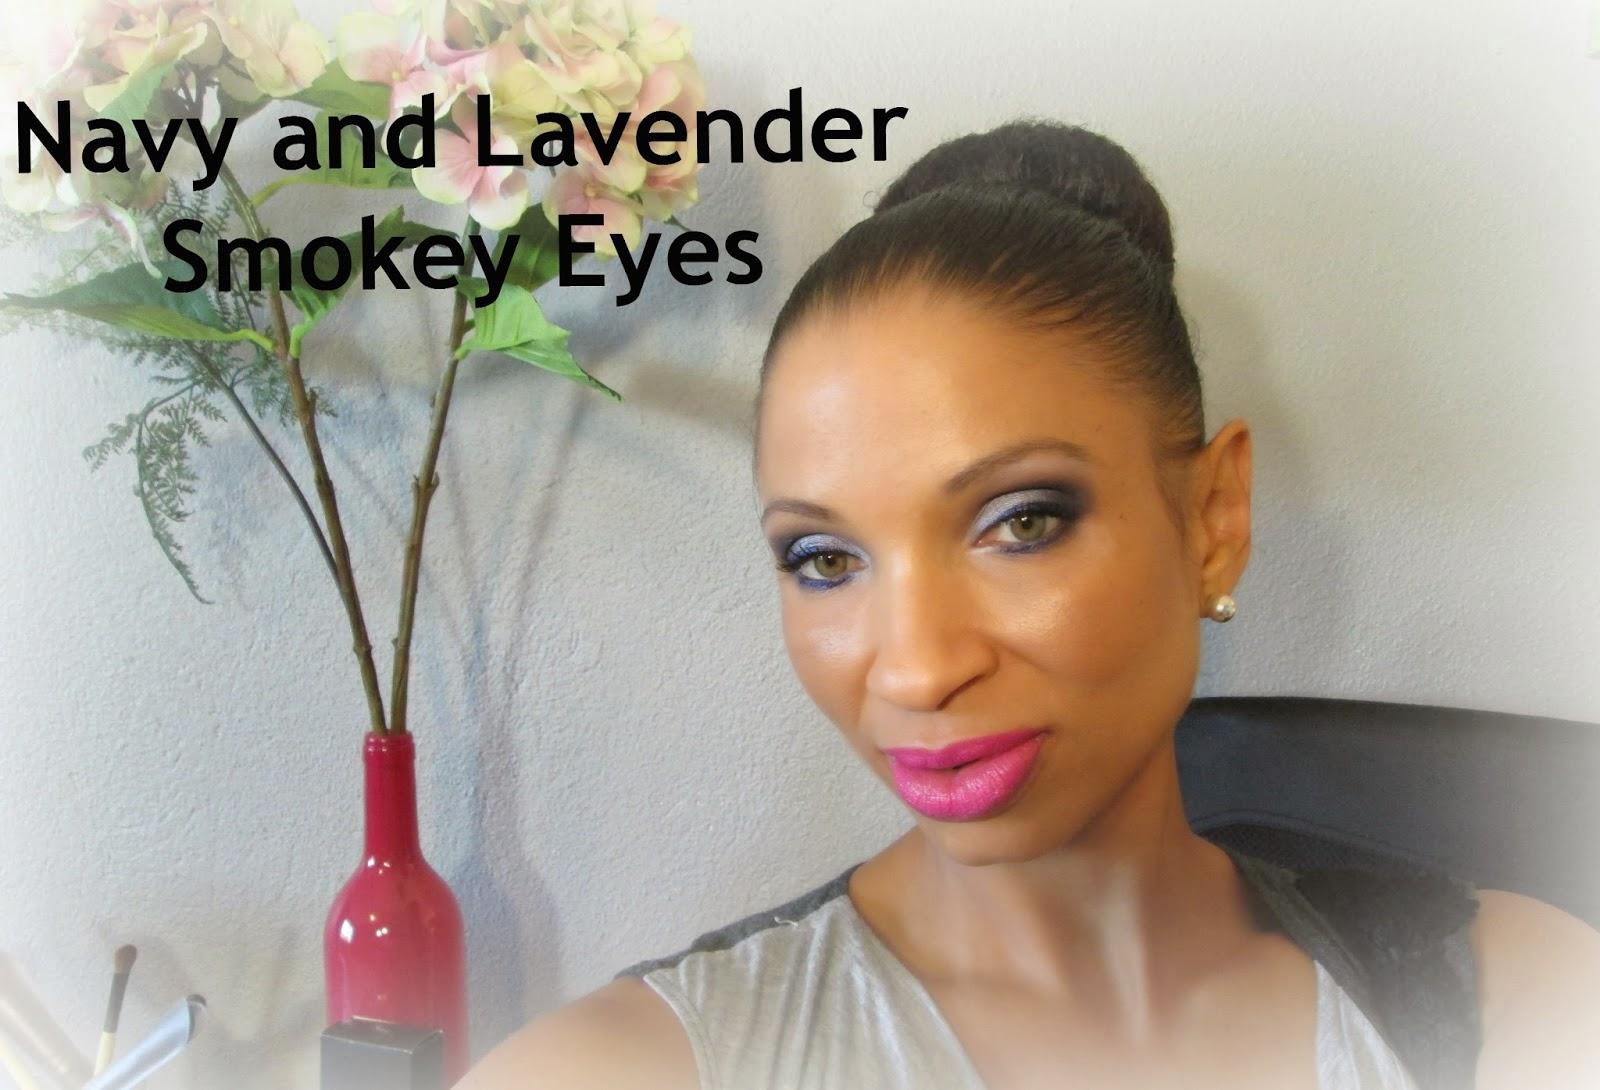 http://chrysalisglam101.blogspot.com/2014/09/navy-and-lavender-smokey-eye-tutorial.html